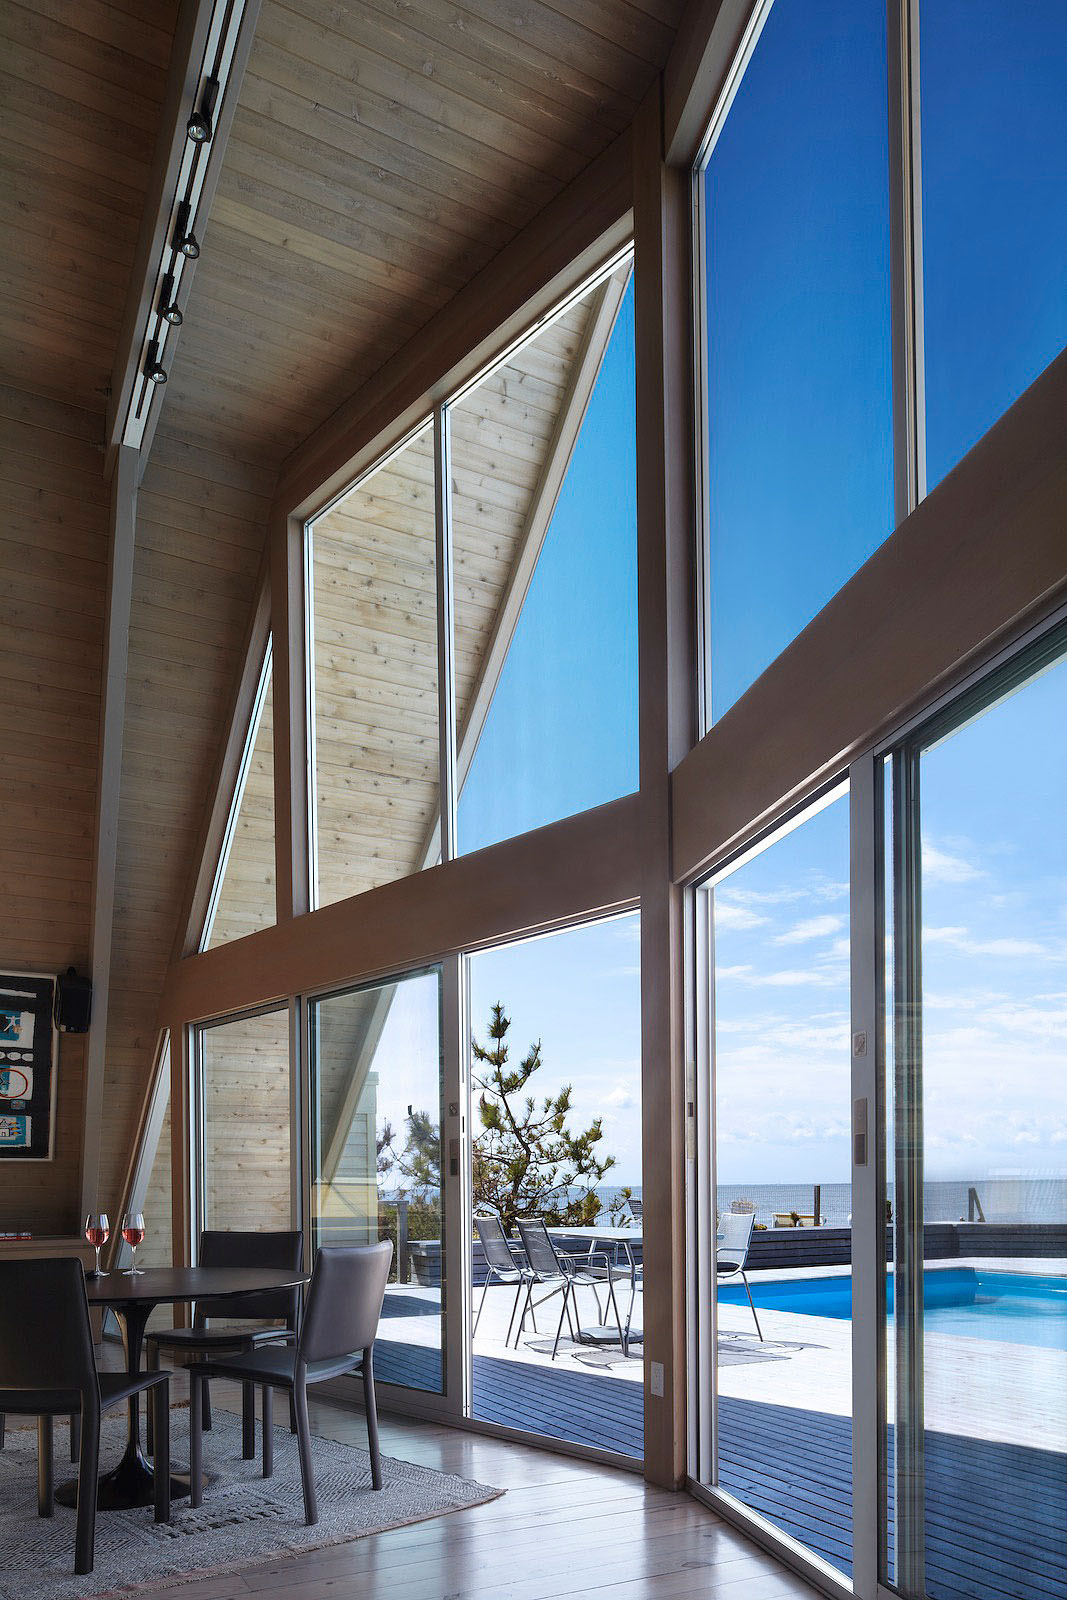 Three Storey AFrame Vacation Beach House  iDesignArch  Interior Design Architecture